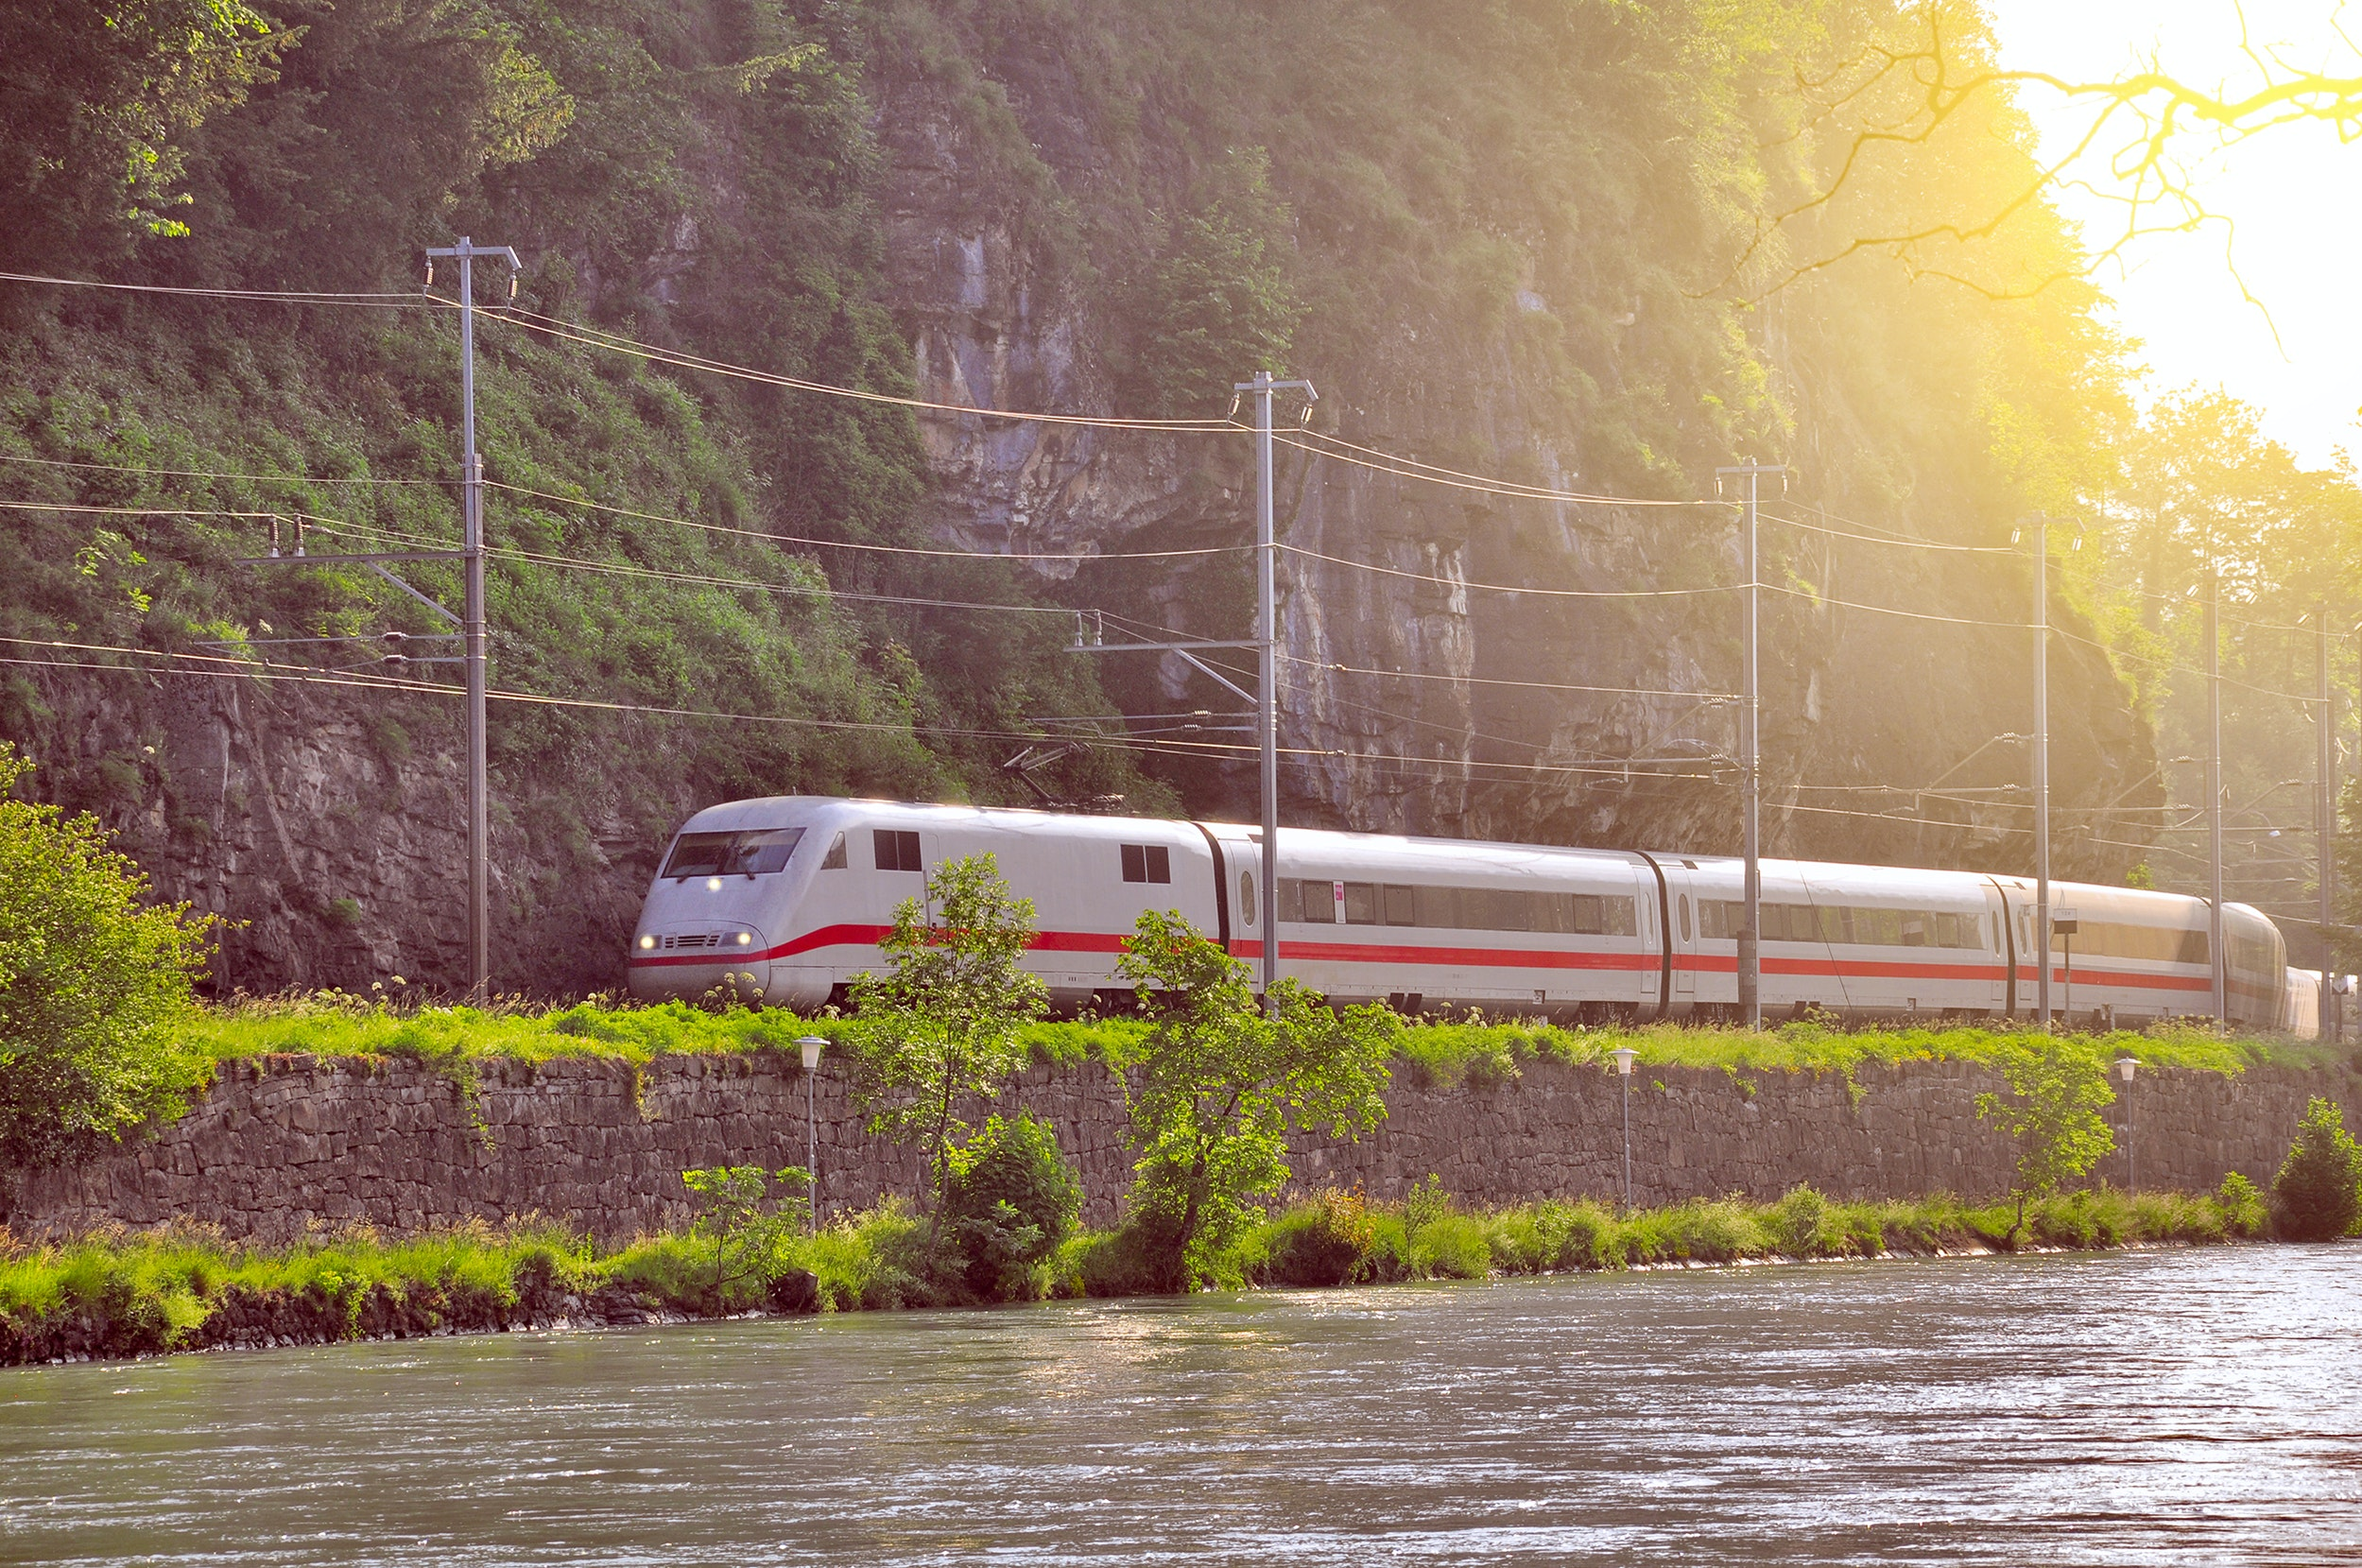 ICE train in Interlaken